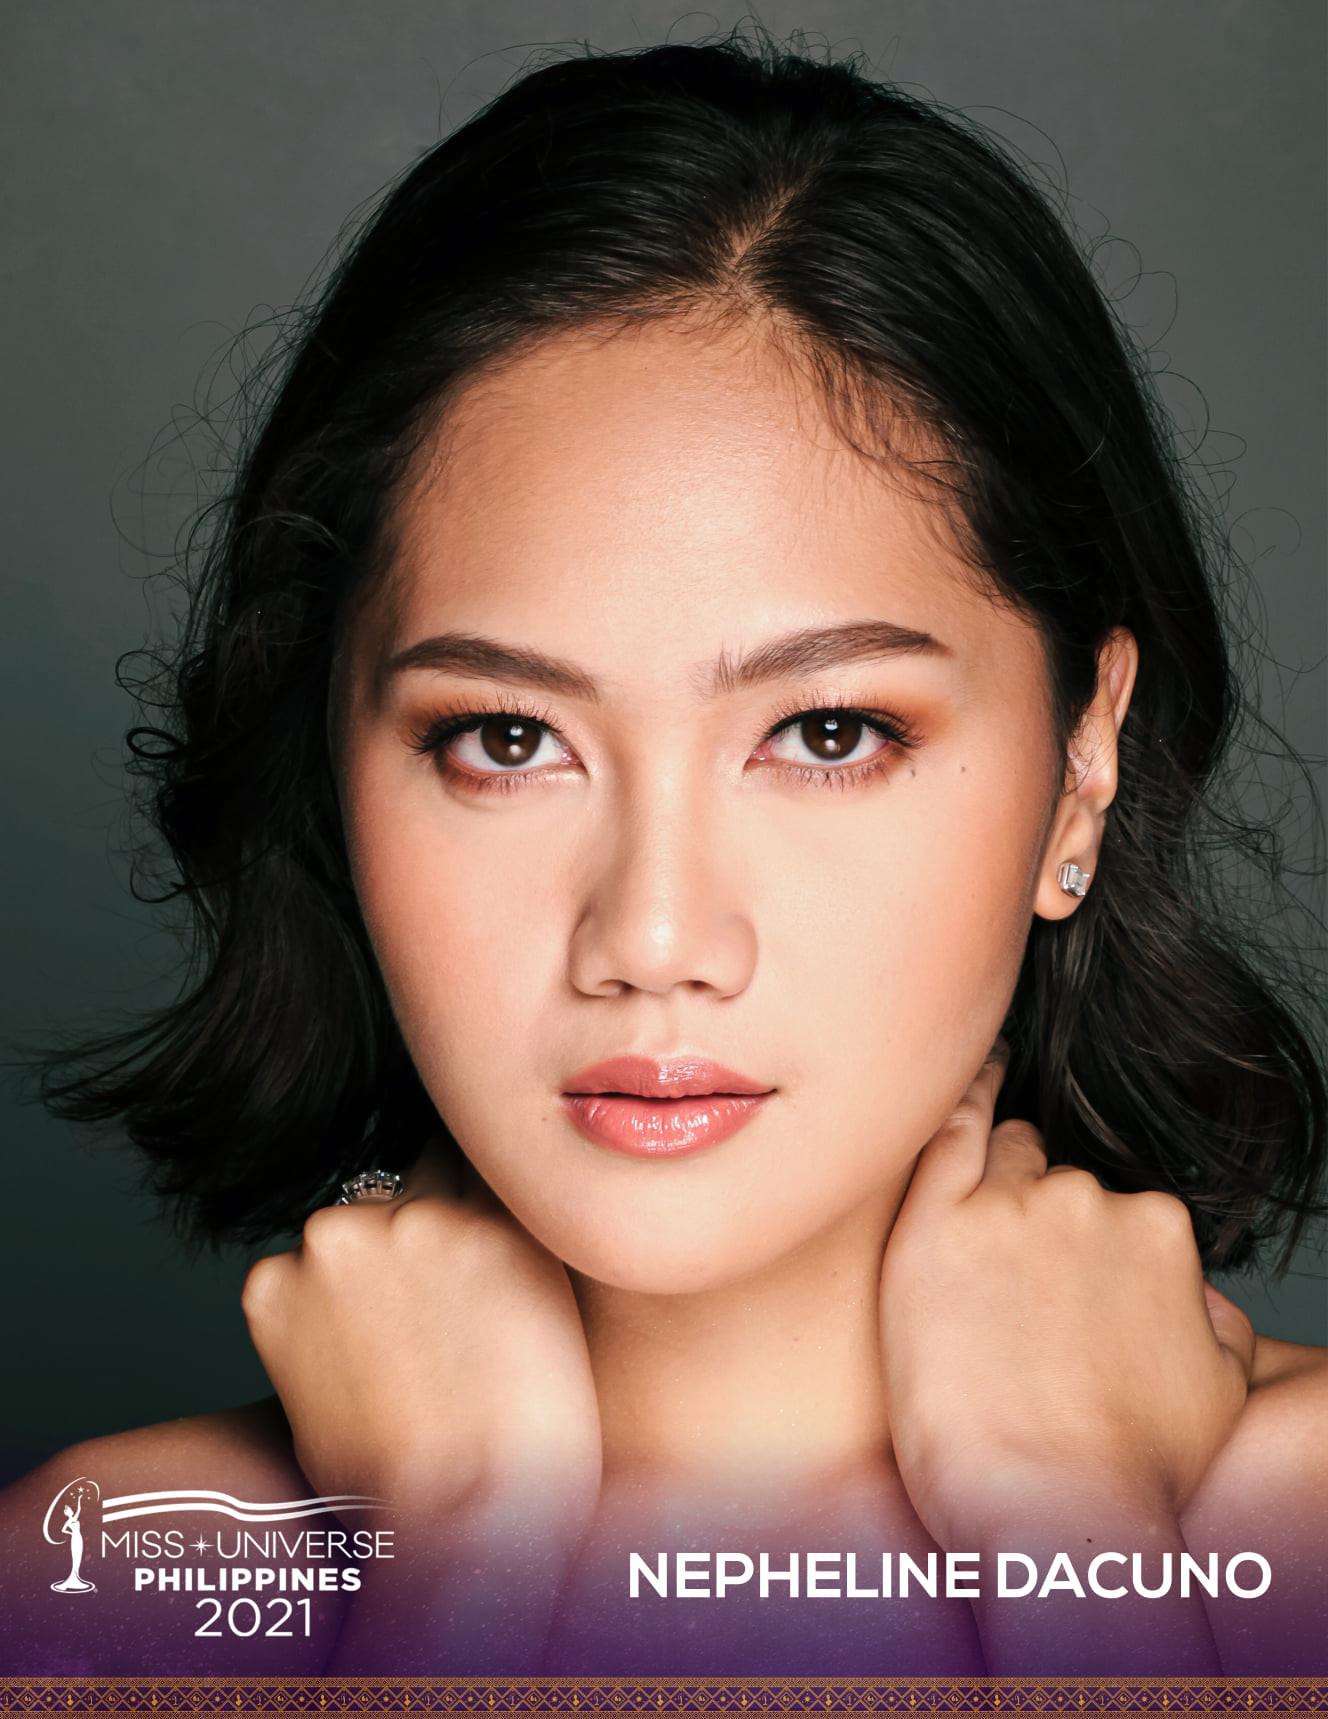 pre-candidatas a miss universe philippines 2021. - Página 5 Al7ihl